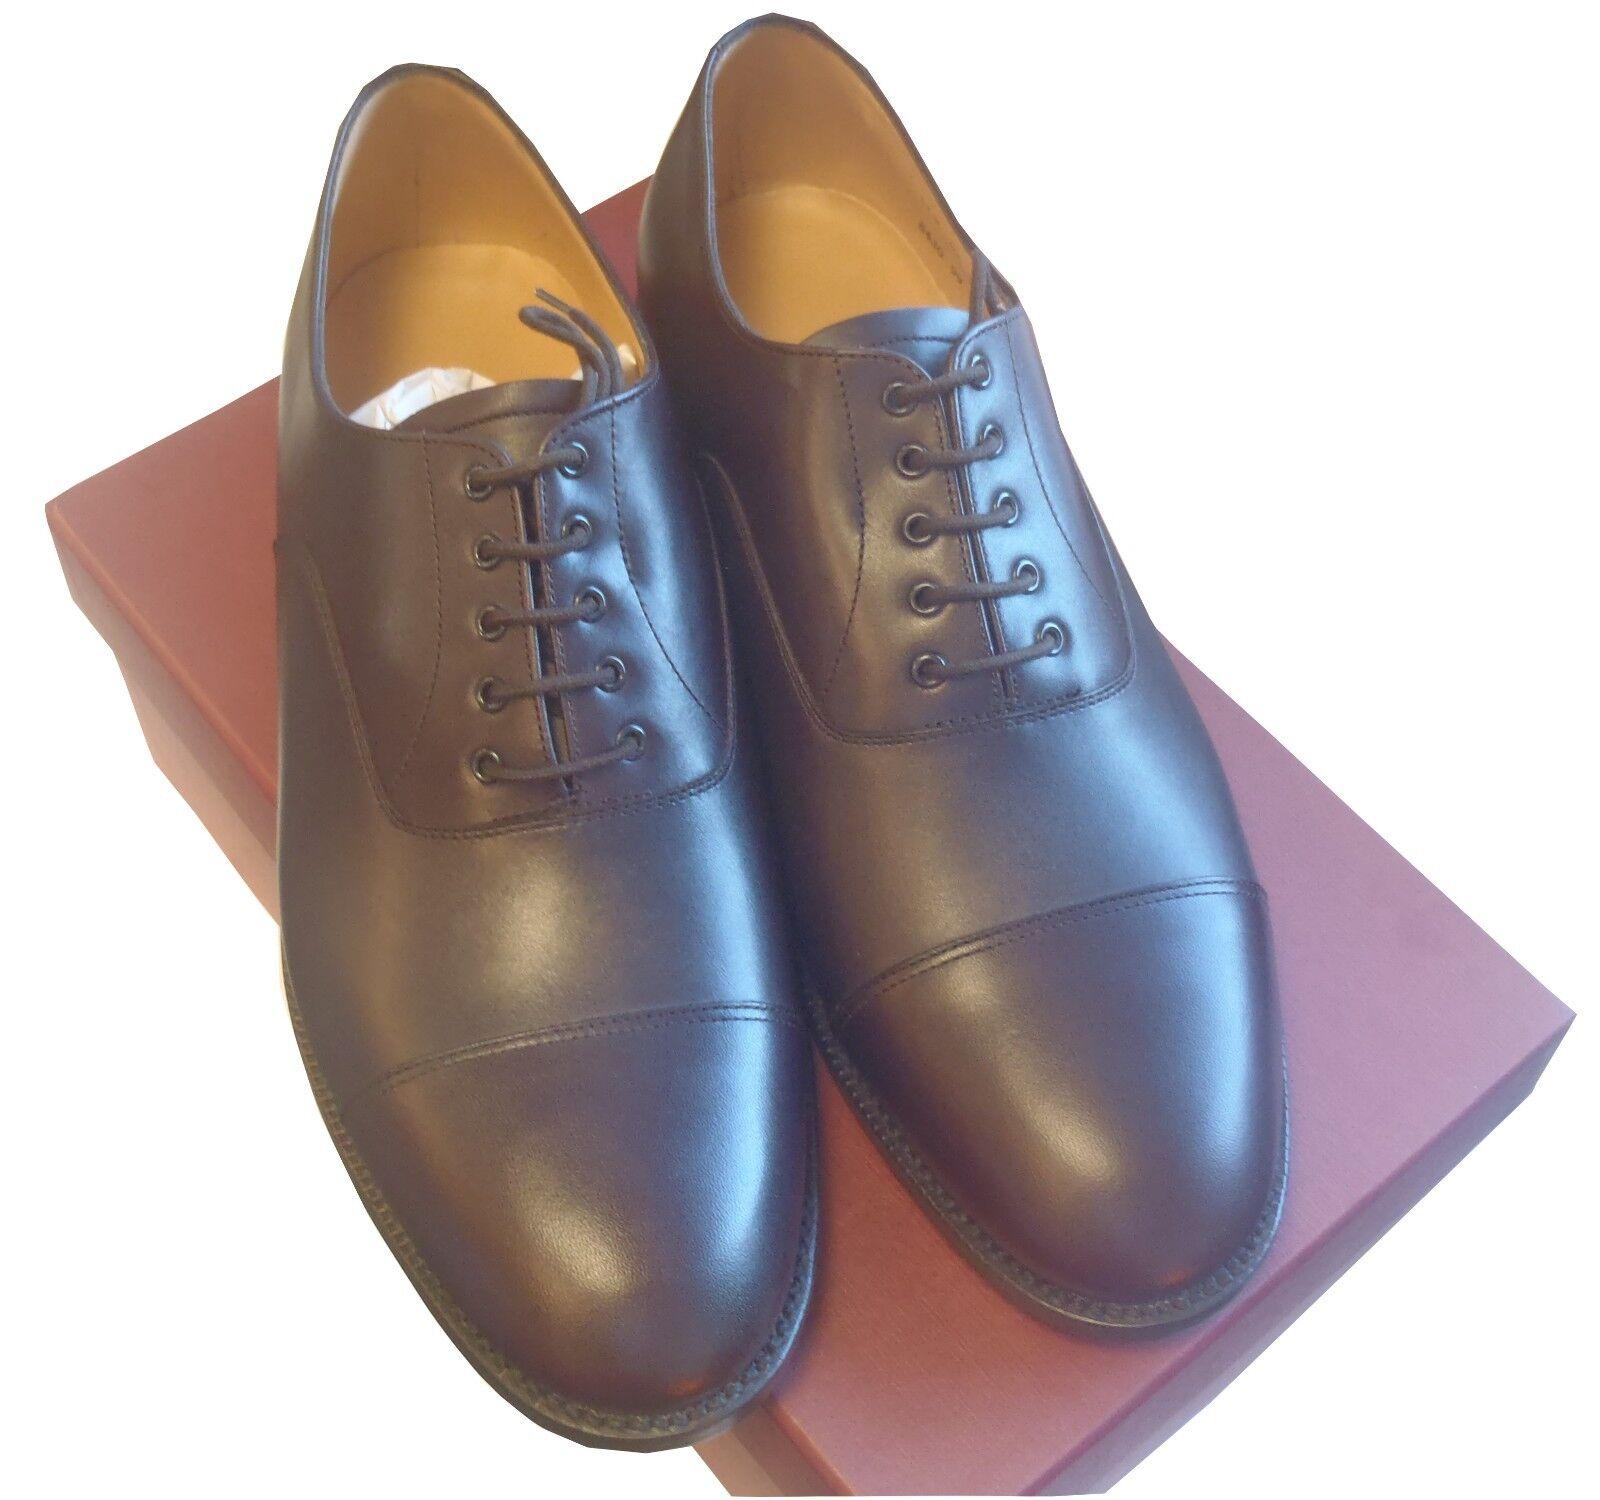 Chaussures de service en cuir marron-Taille 10 medium-Neuf (en boîte) boîte) boîte) - DFN1304 65bbc8